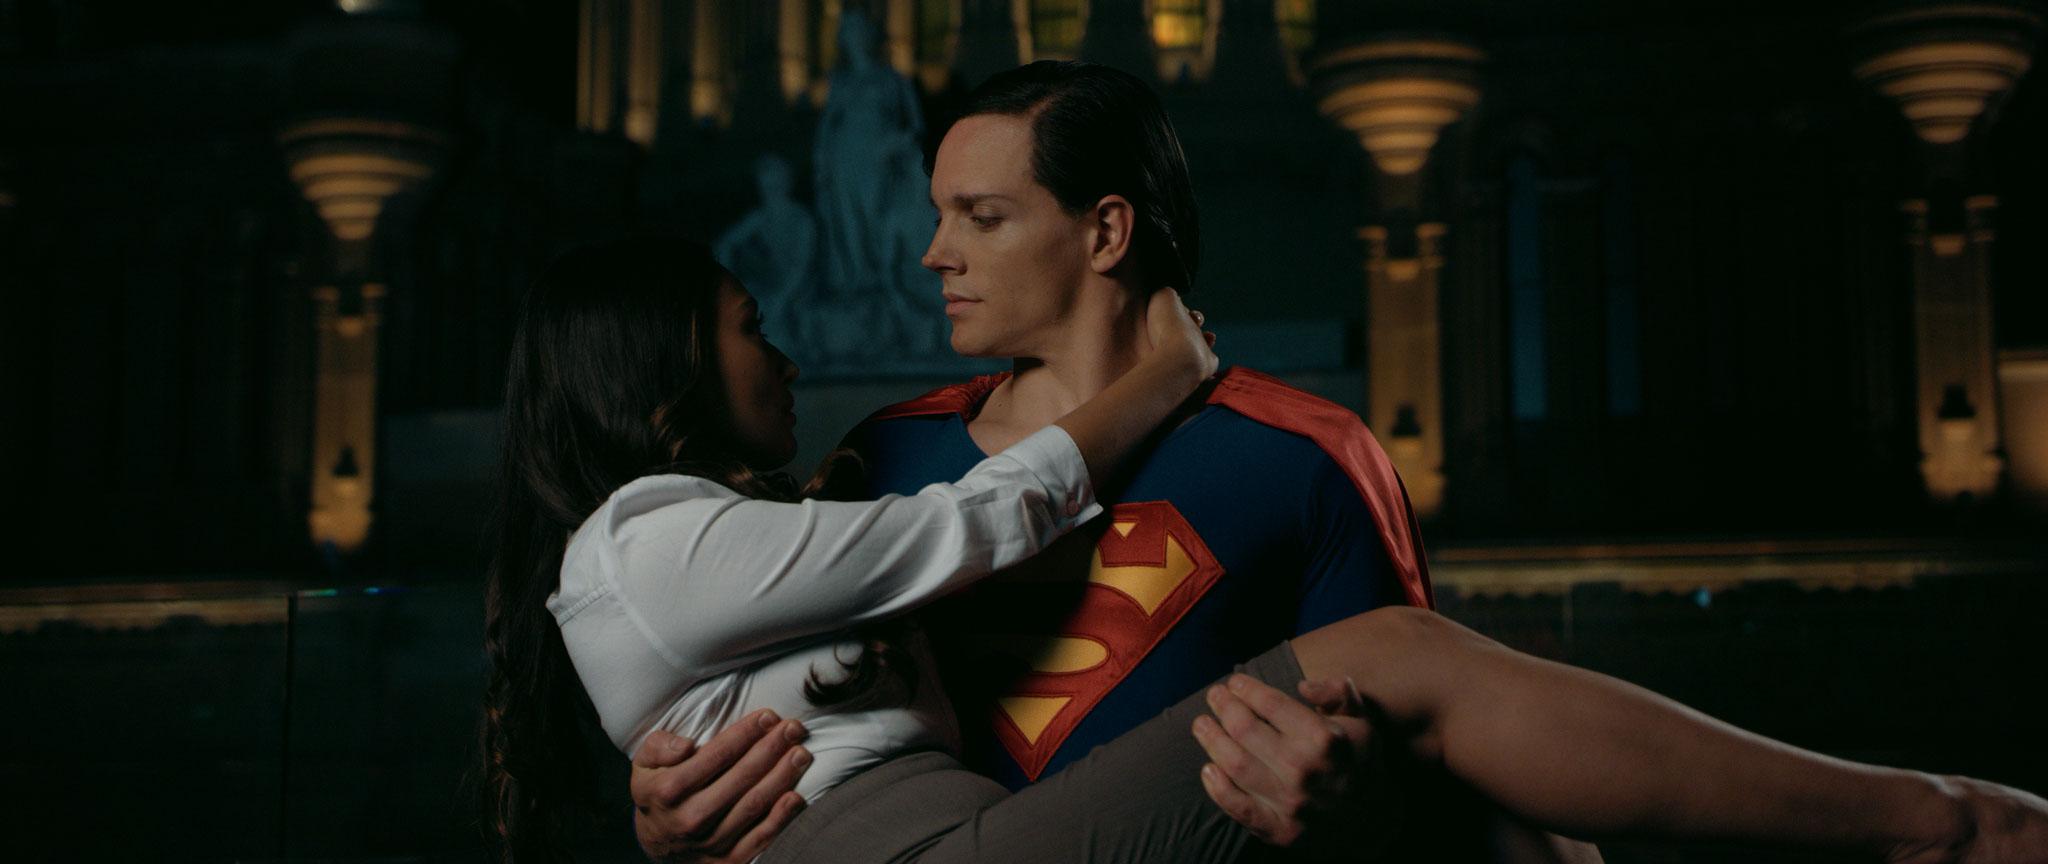 SupermanMeetsBatman